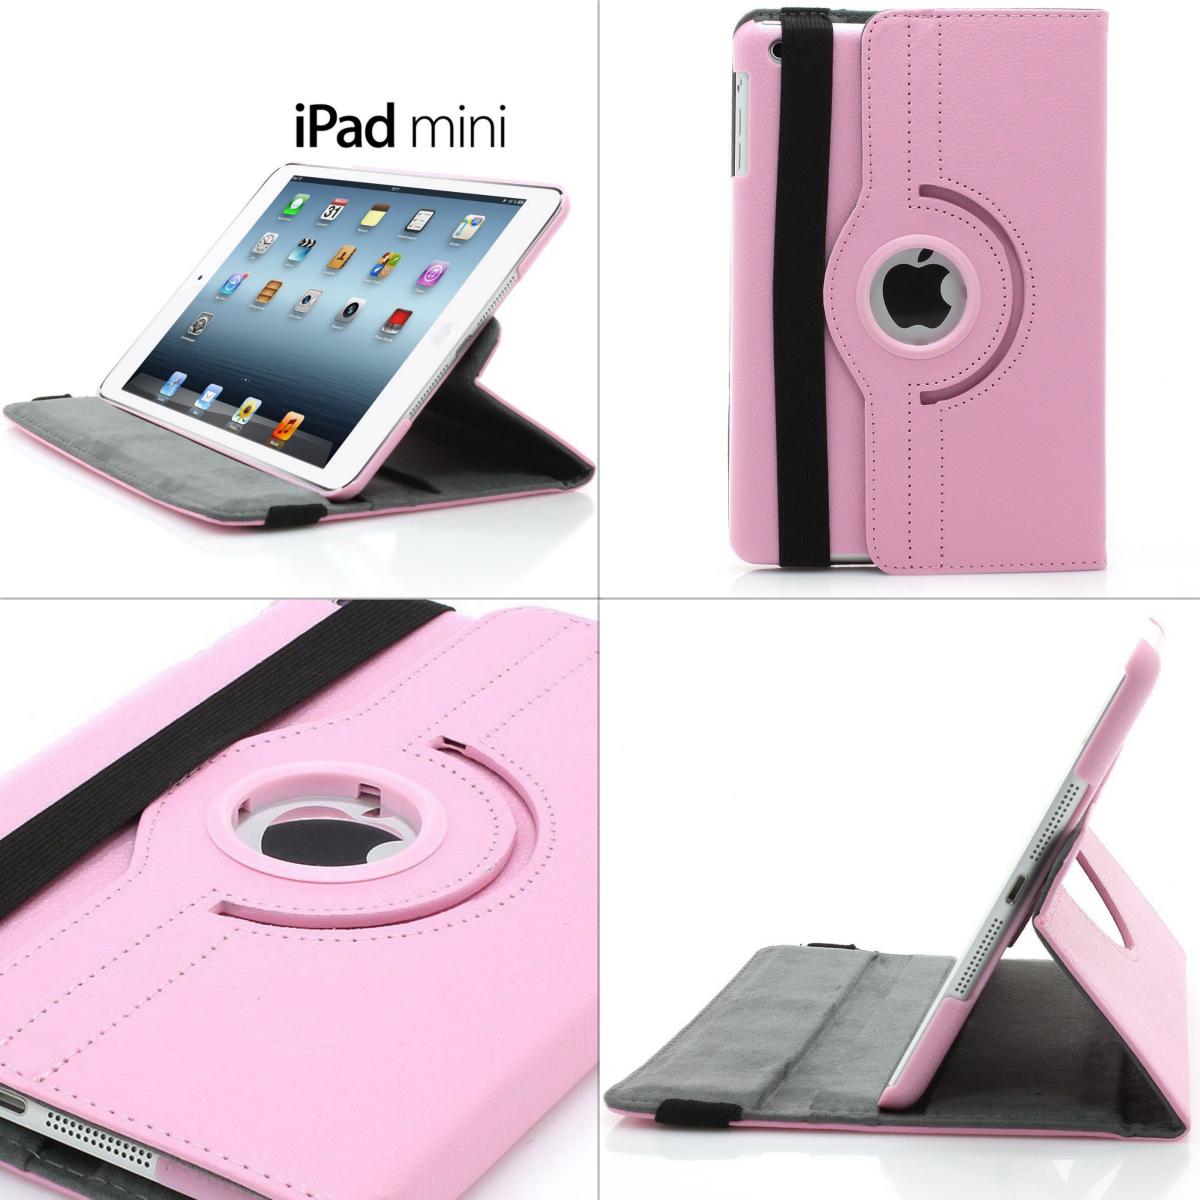 XAiOX iPad Mini Kunstledertasche 360° drehbar - rosa